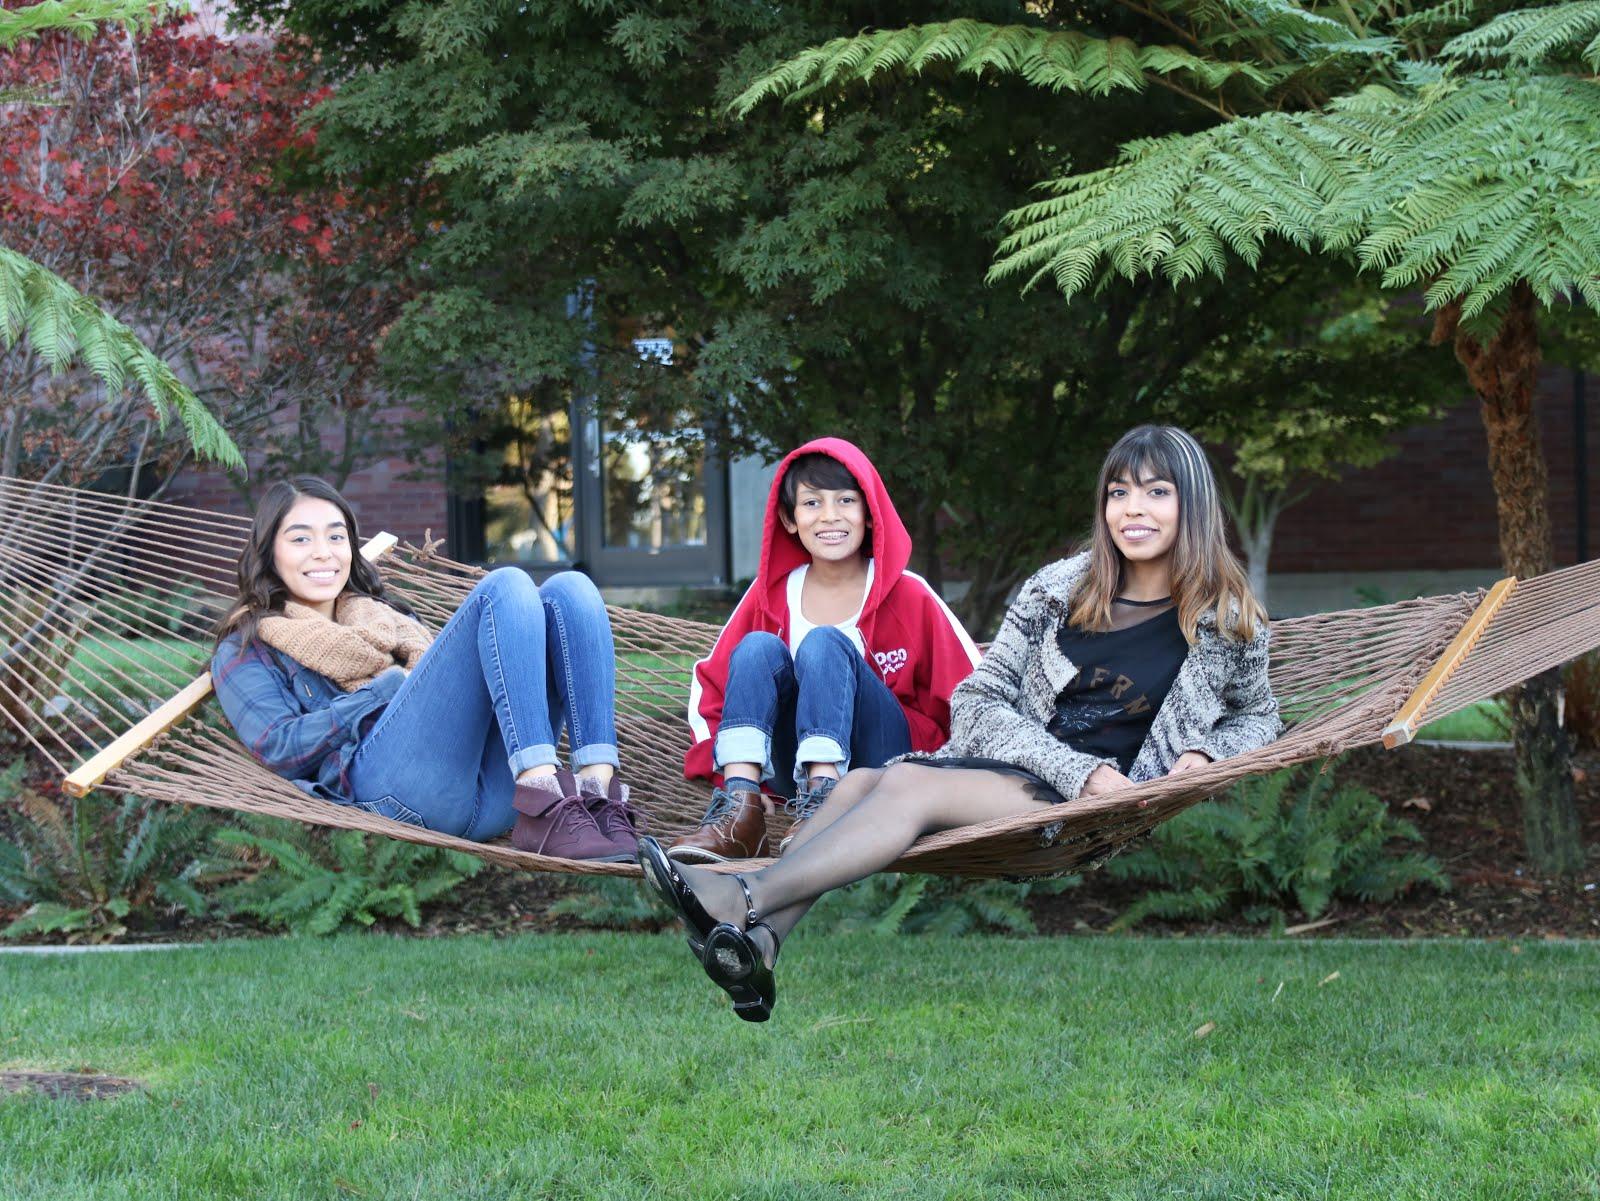 pixar studios hammock